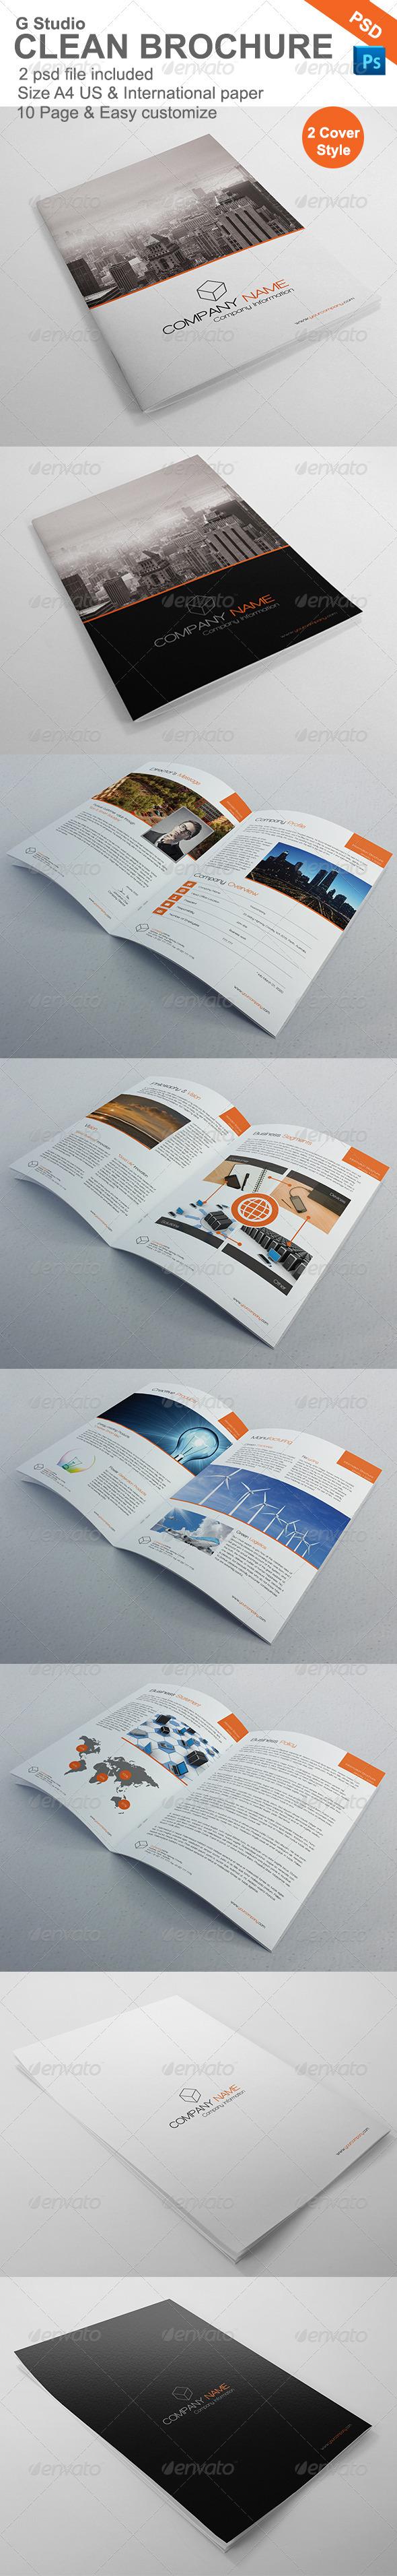 Gstudio Clean Brochure Template - Brochures Print Templates